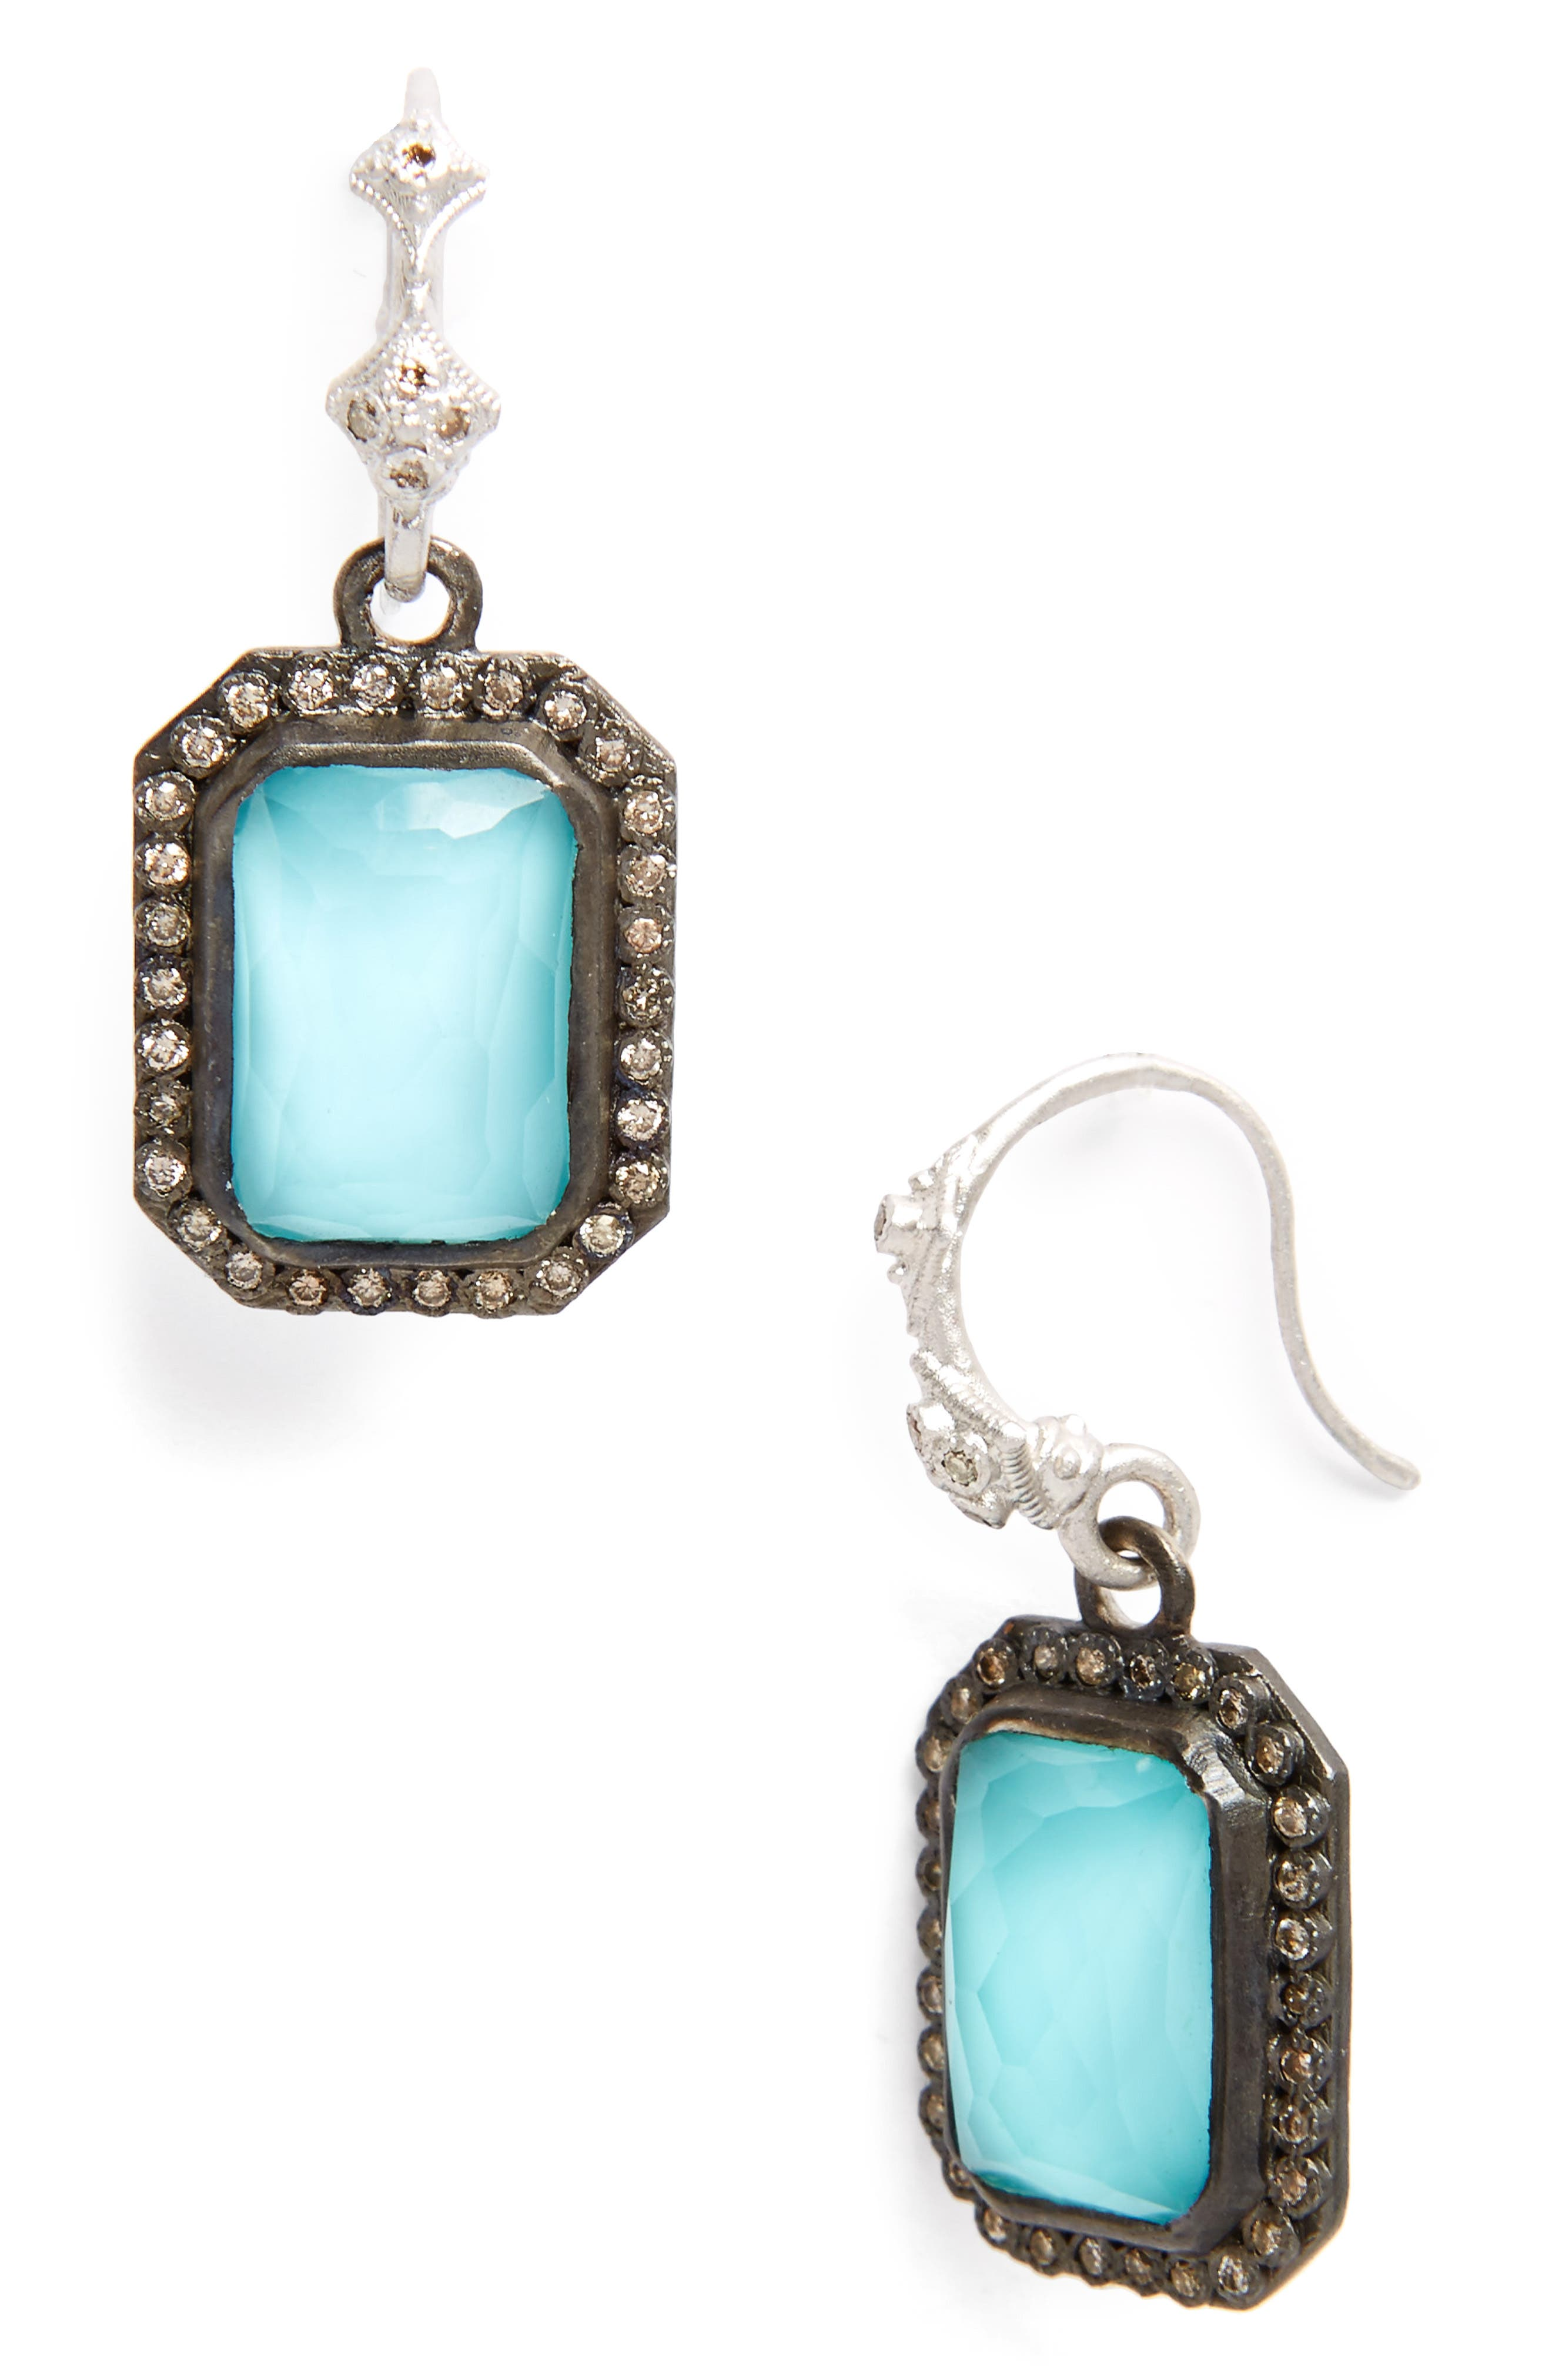 New World Drop Earrings,                             Main thumbnail 1, color,                             Silver